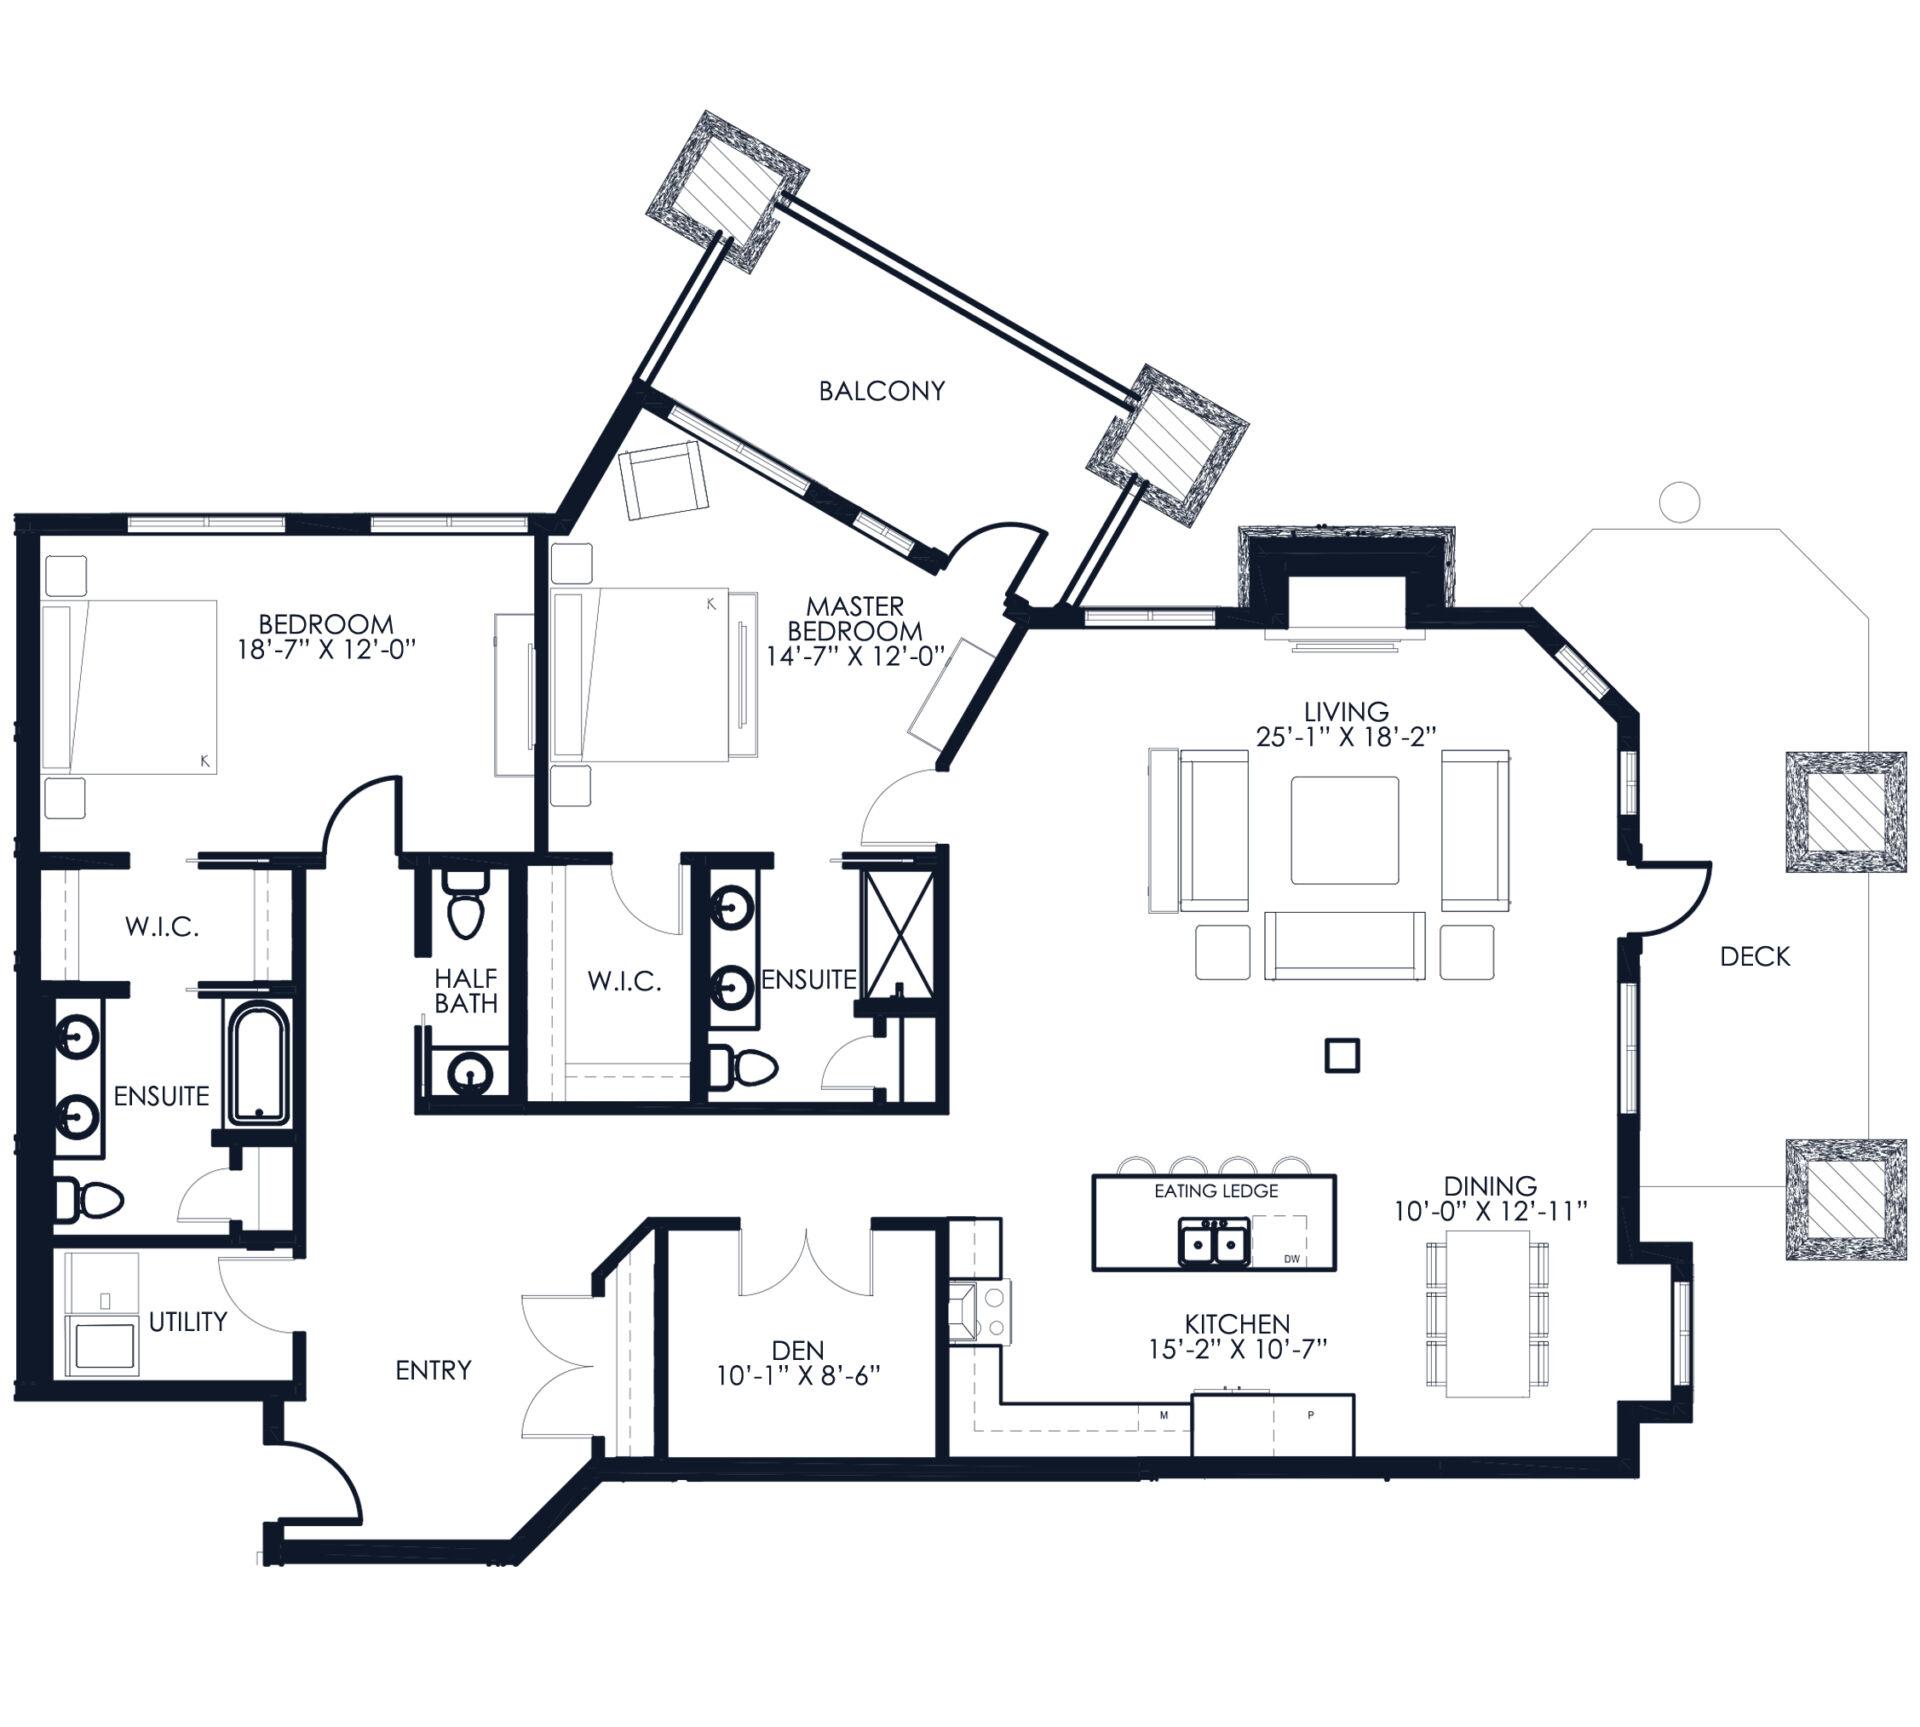 Unit A115 floor plan